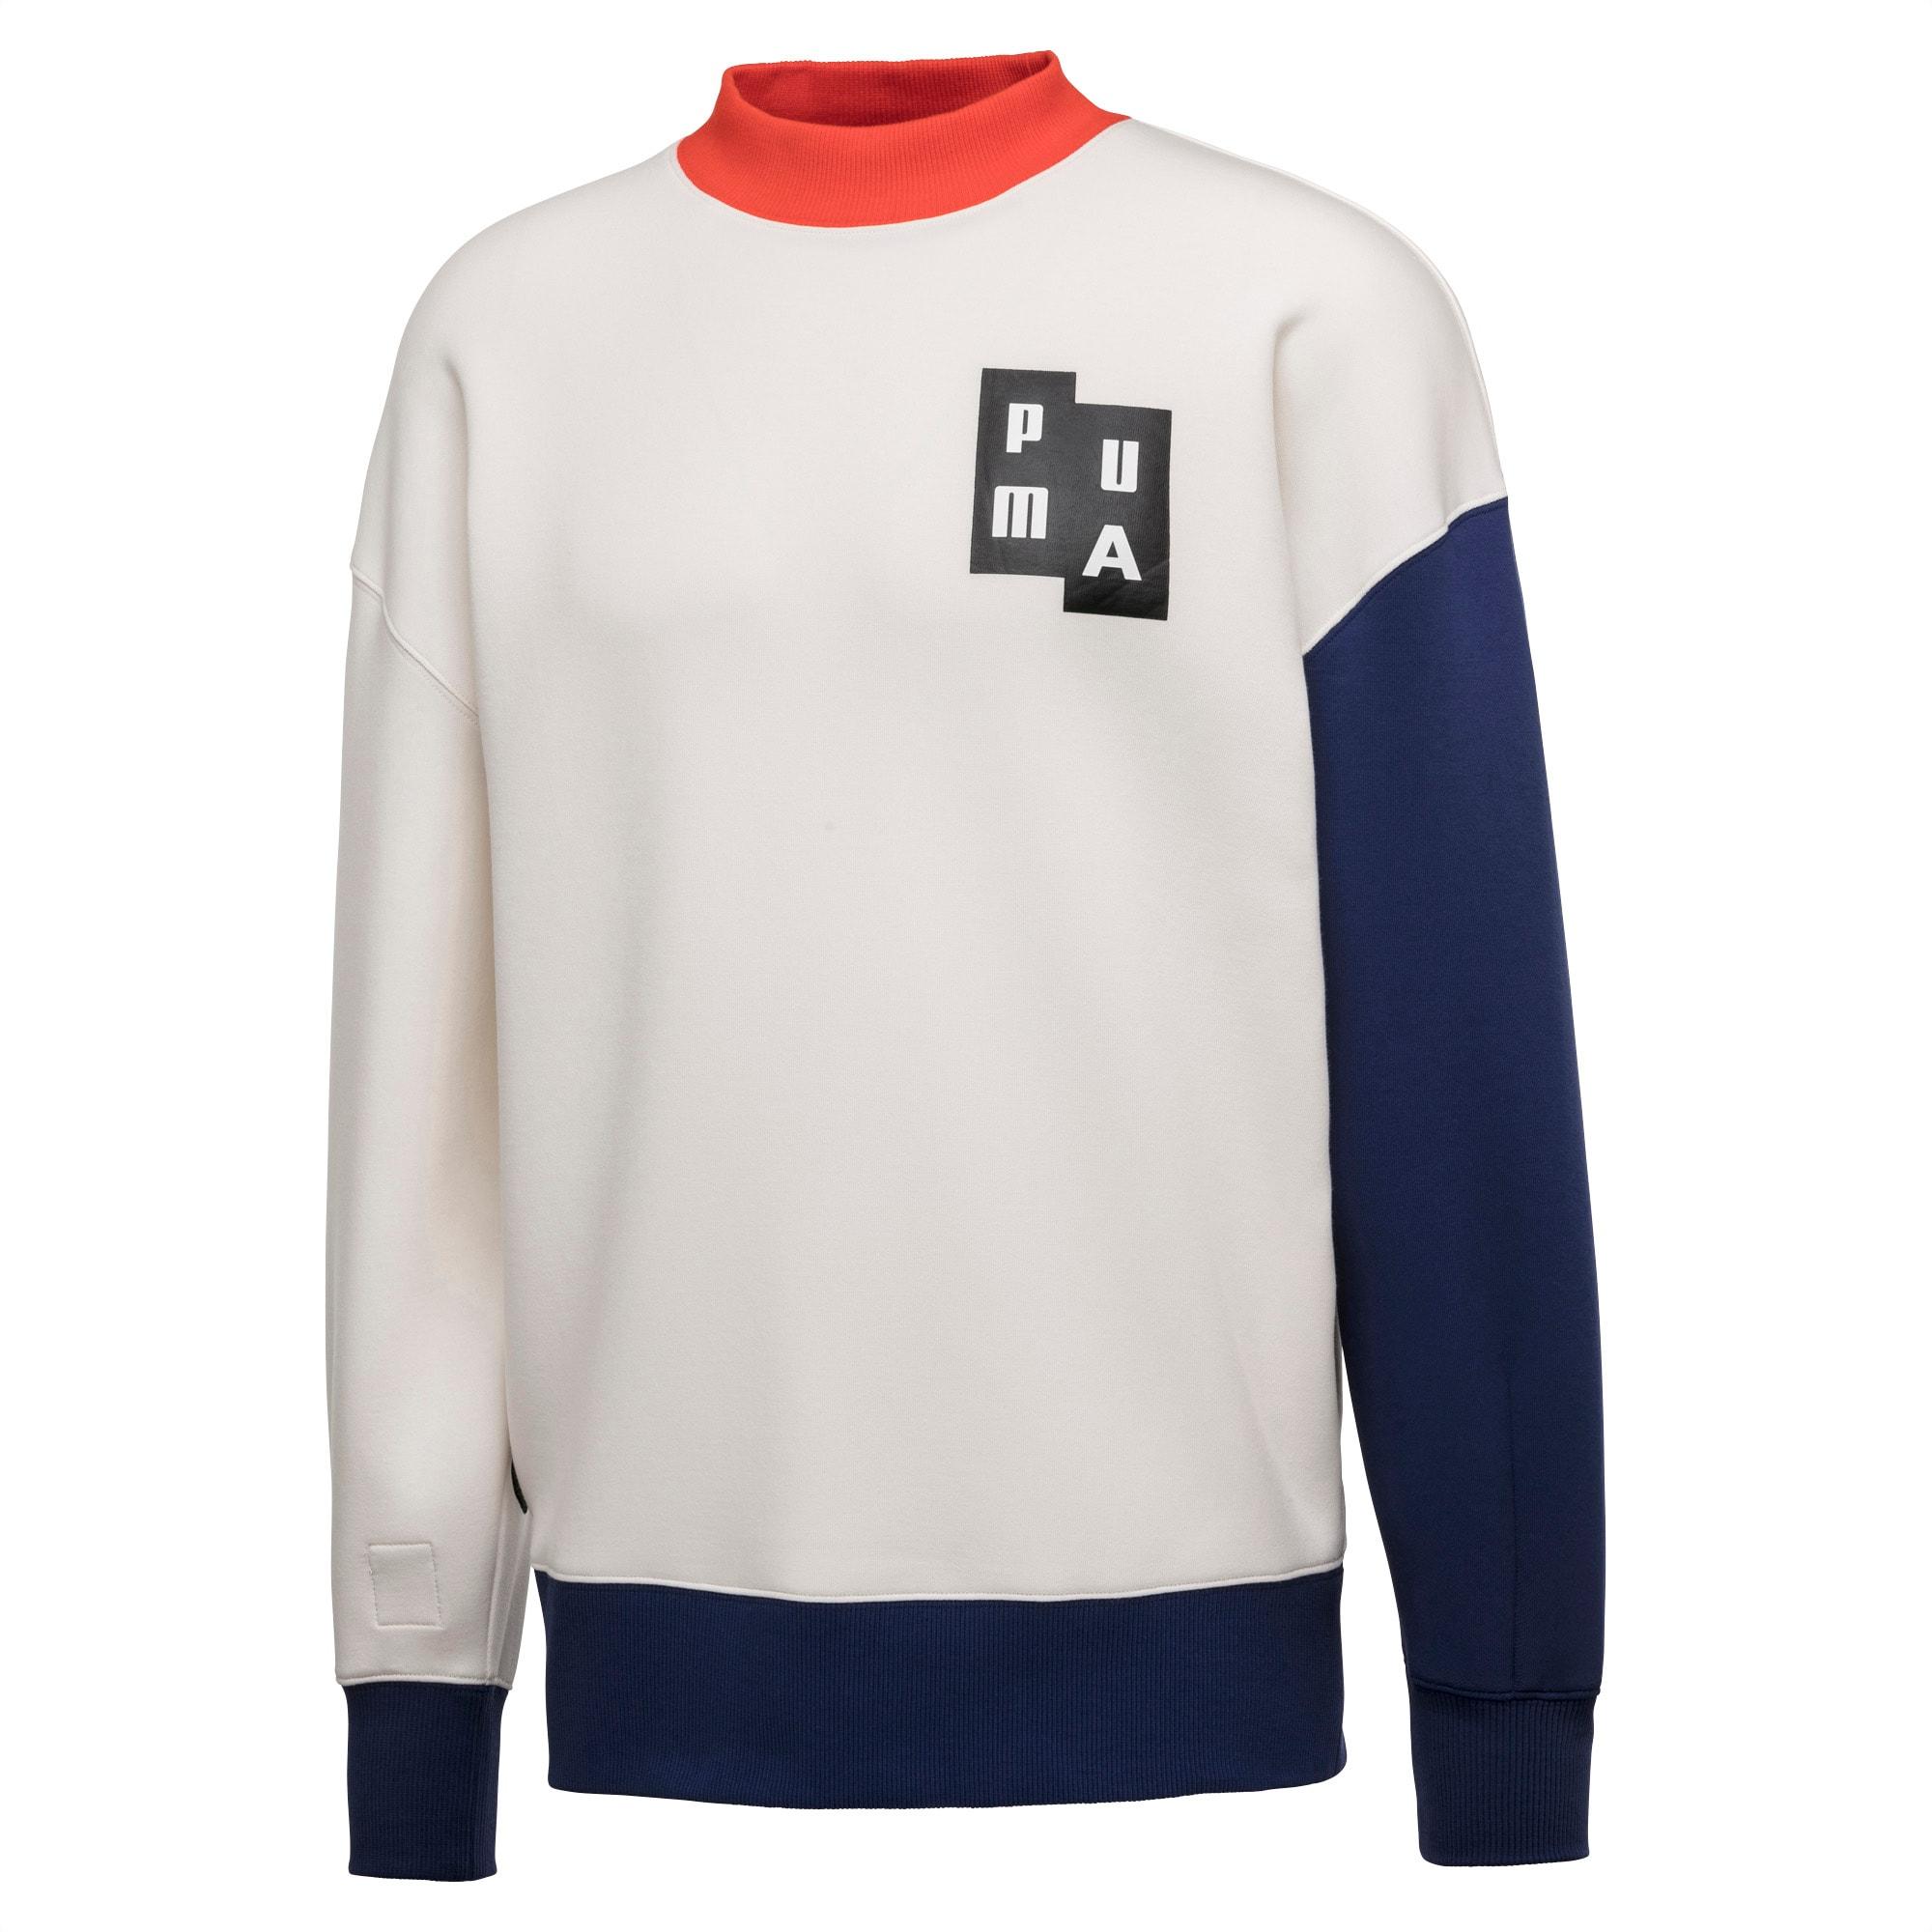 PUMA x ADER ERROR Crewneck Sweatshirt | PUMA US